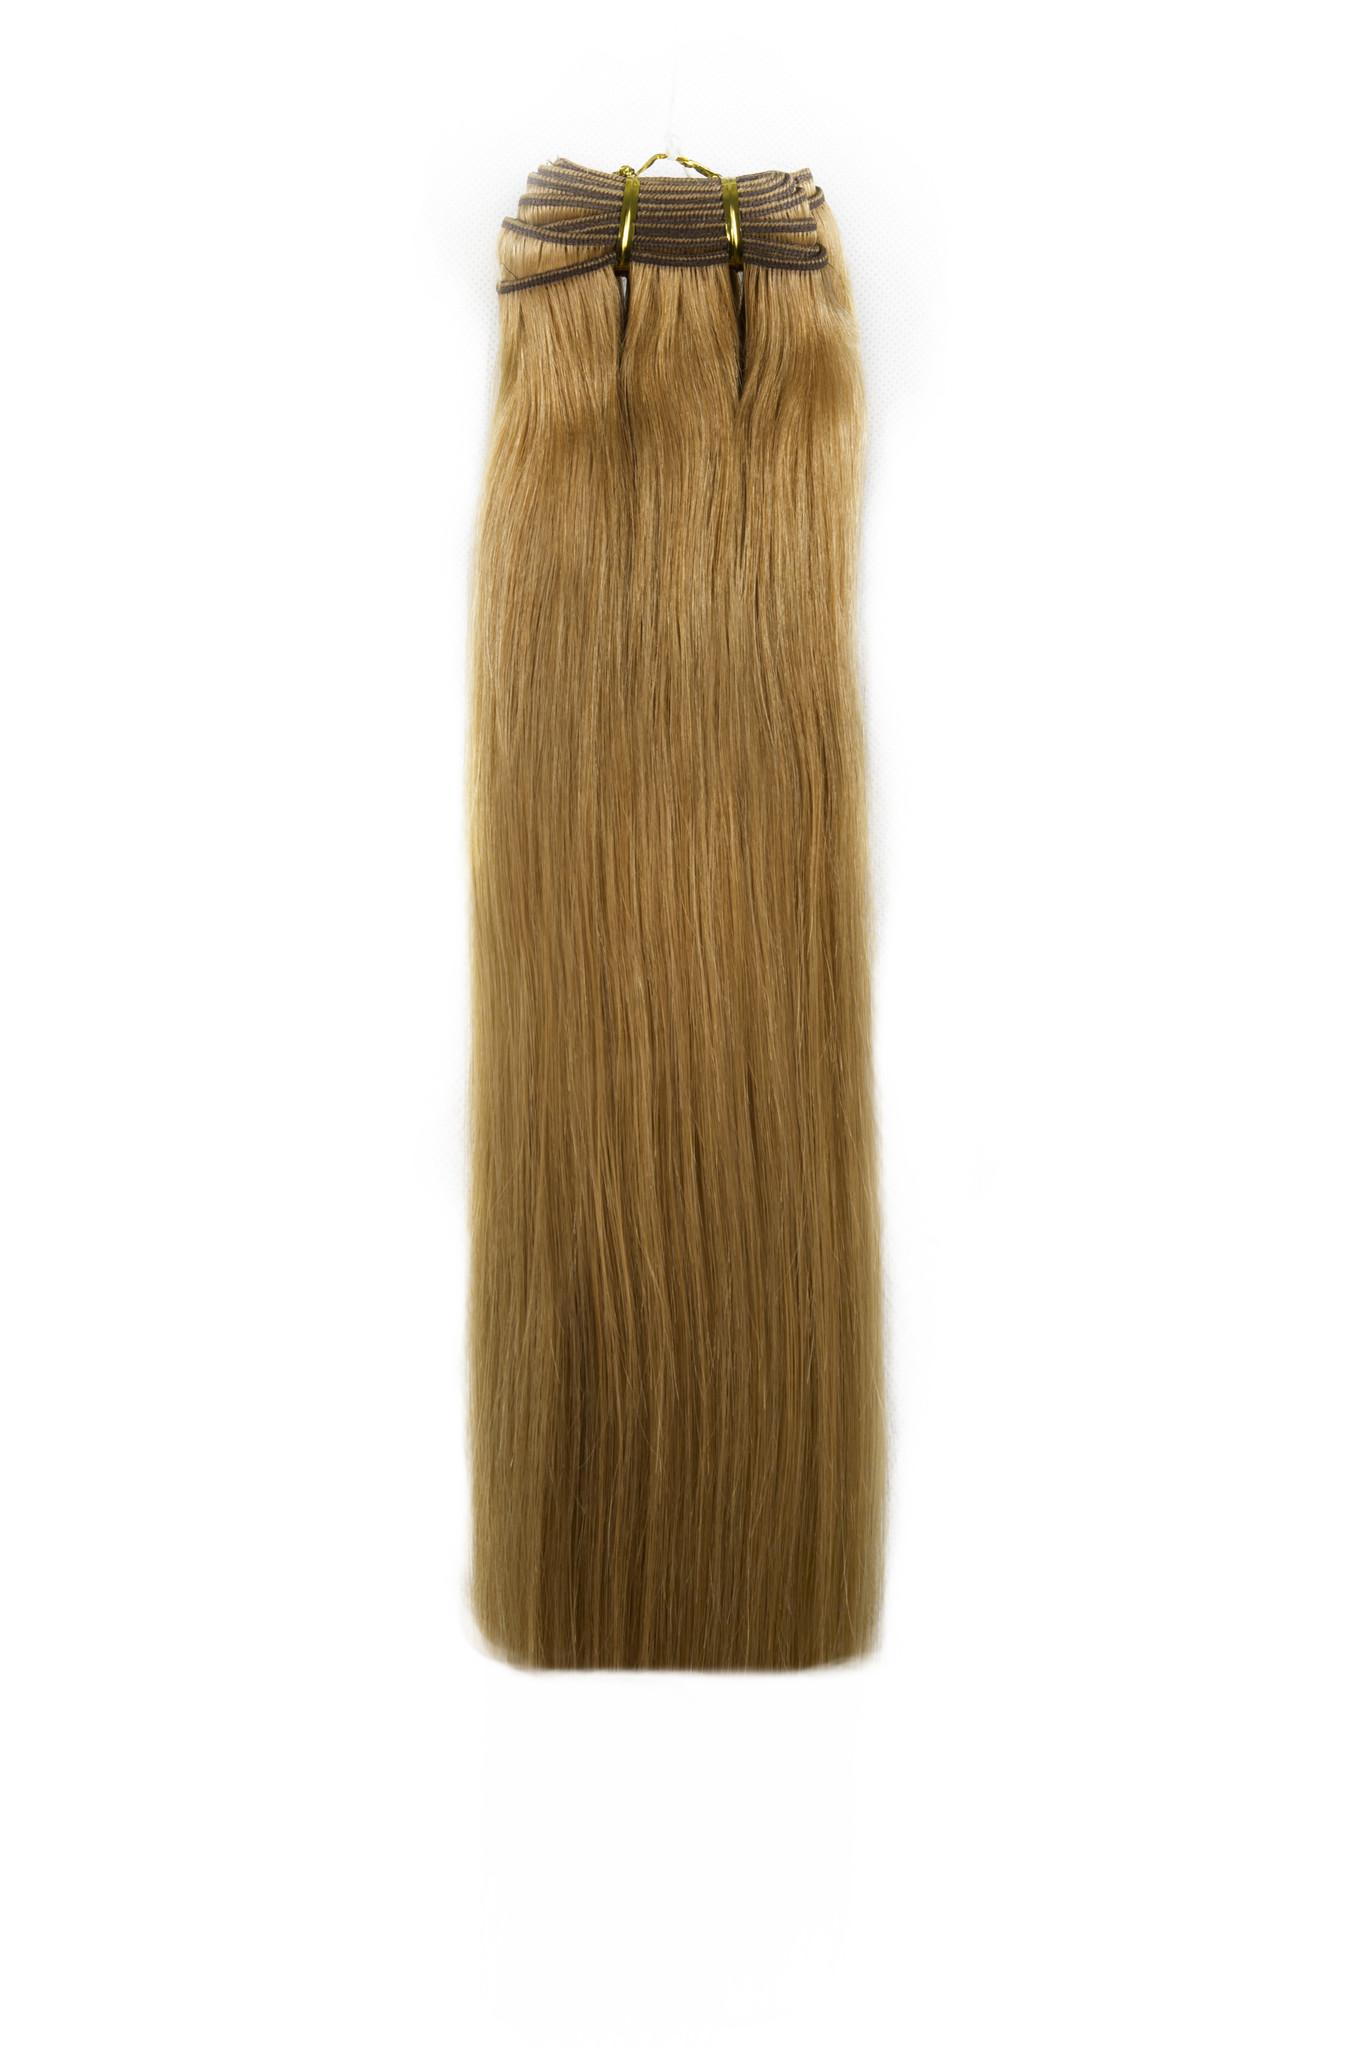 SilverFox Weave - #27 Dark Blonde